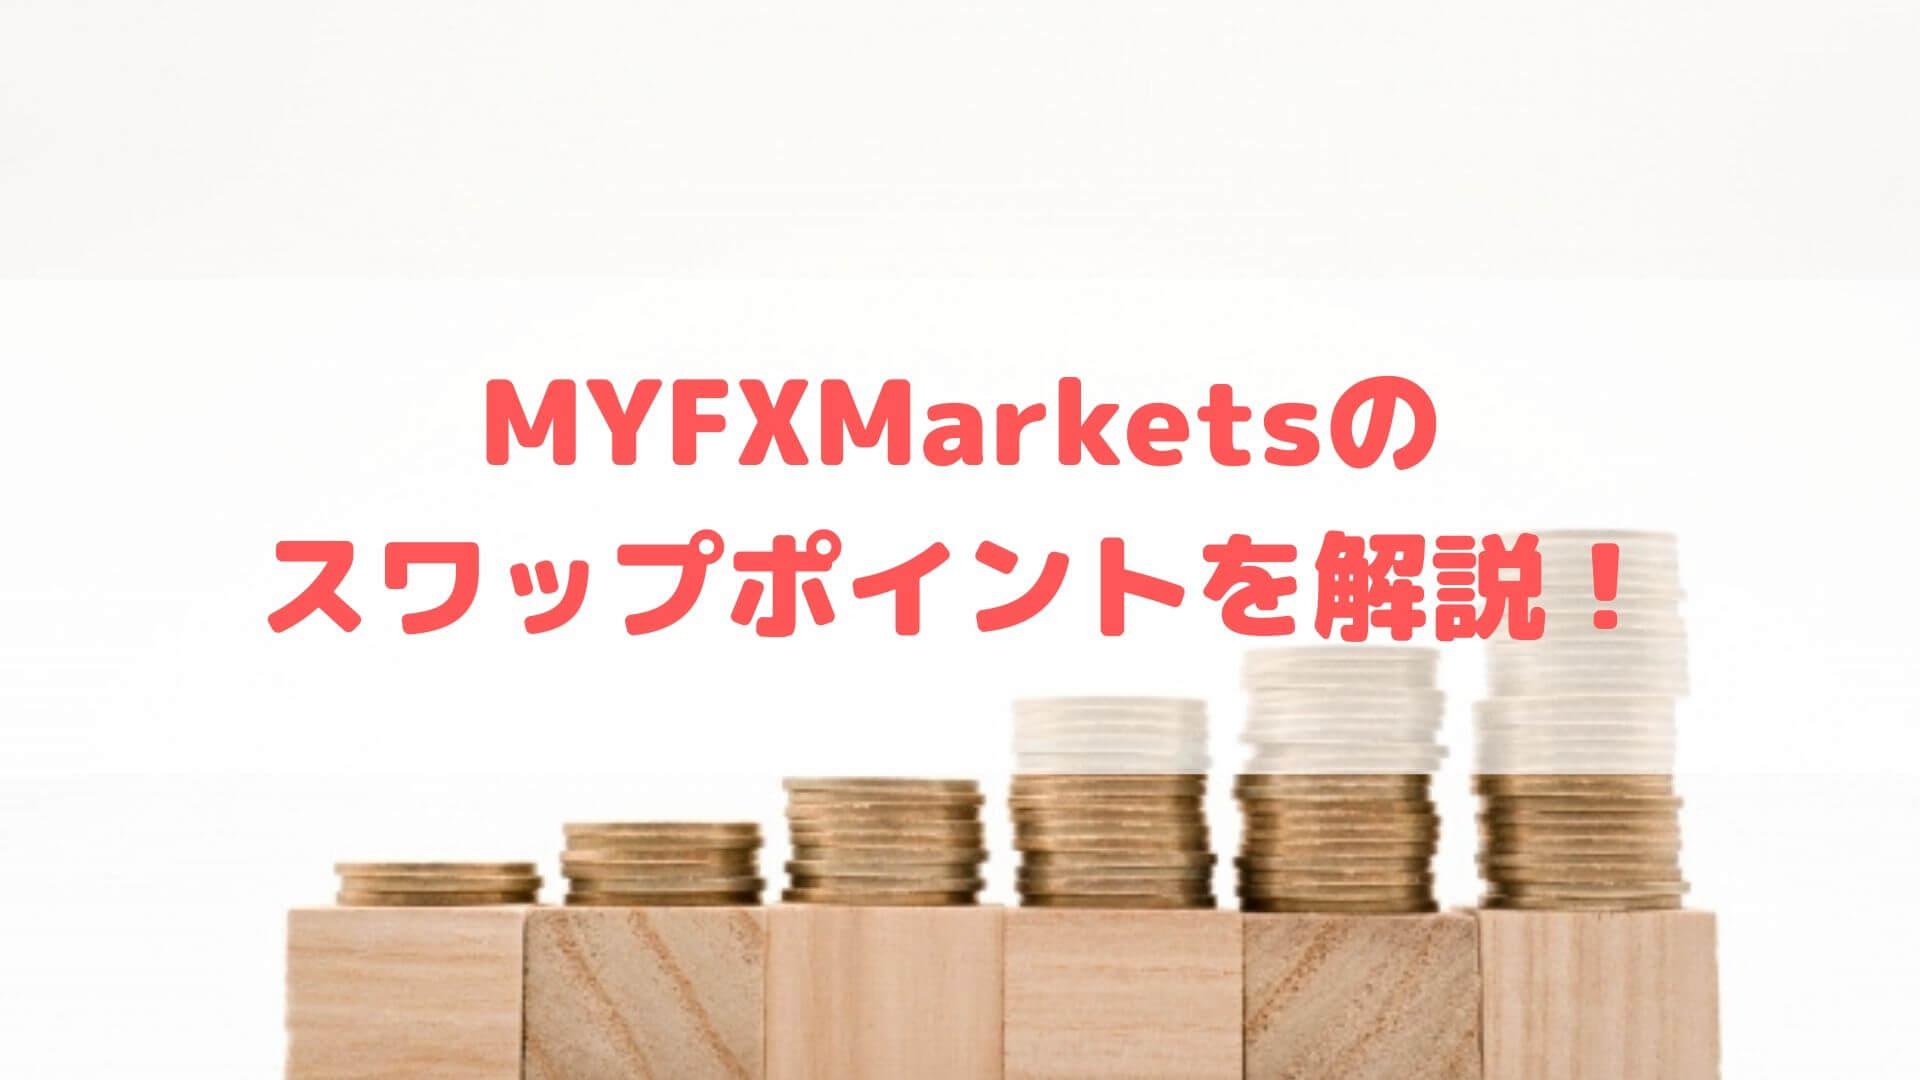 MYFXMarkets スワップポイント